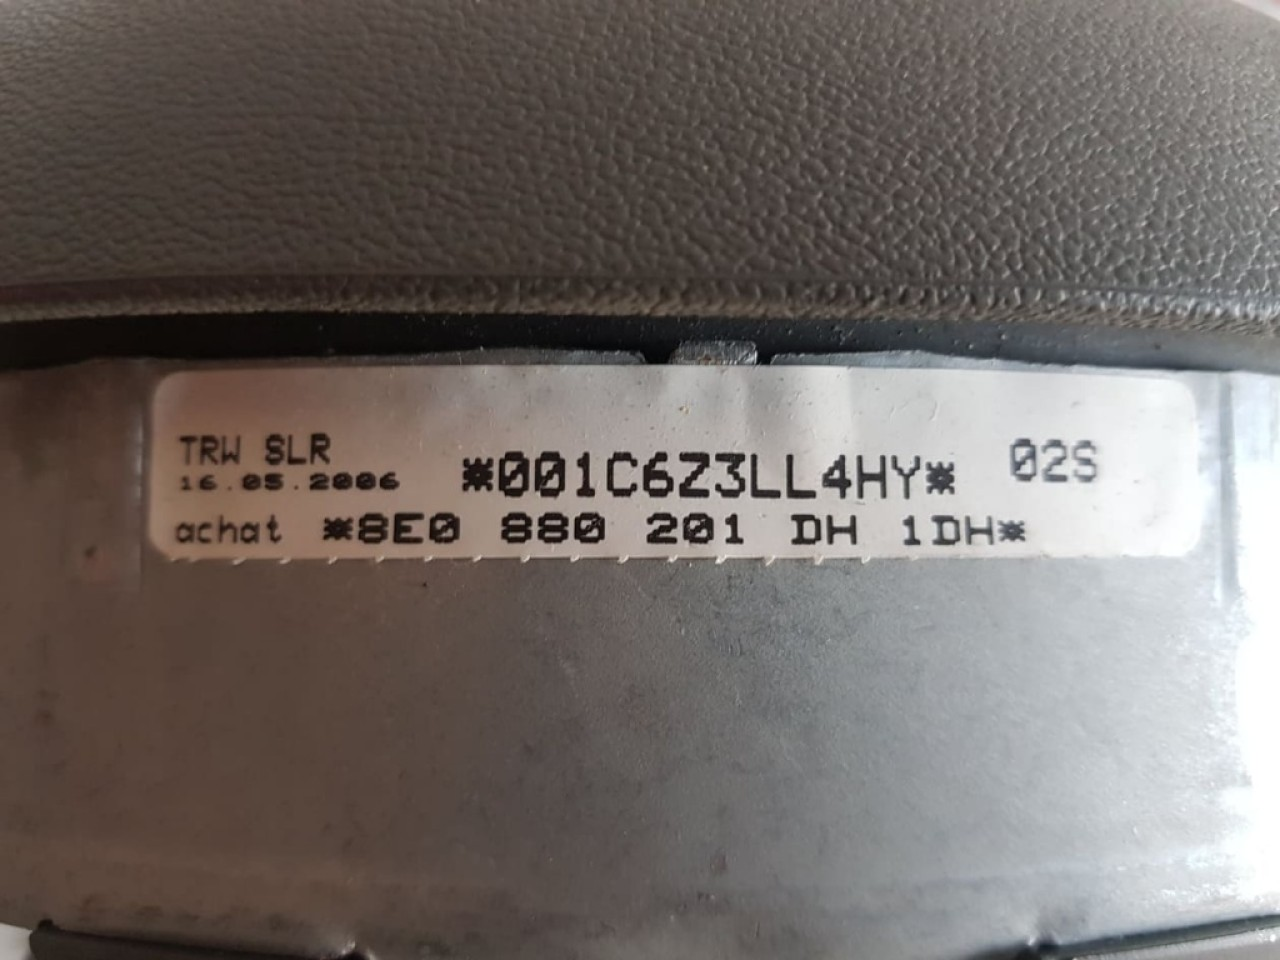 Airbag volan 3 spite culoare gri Audi A4 B7 8e0880201dh